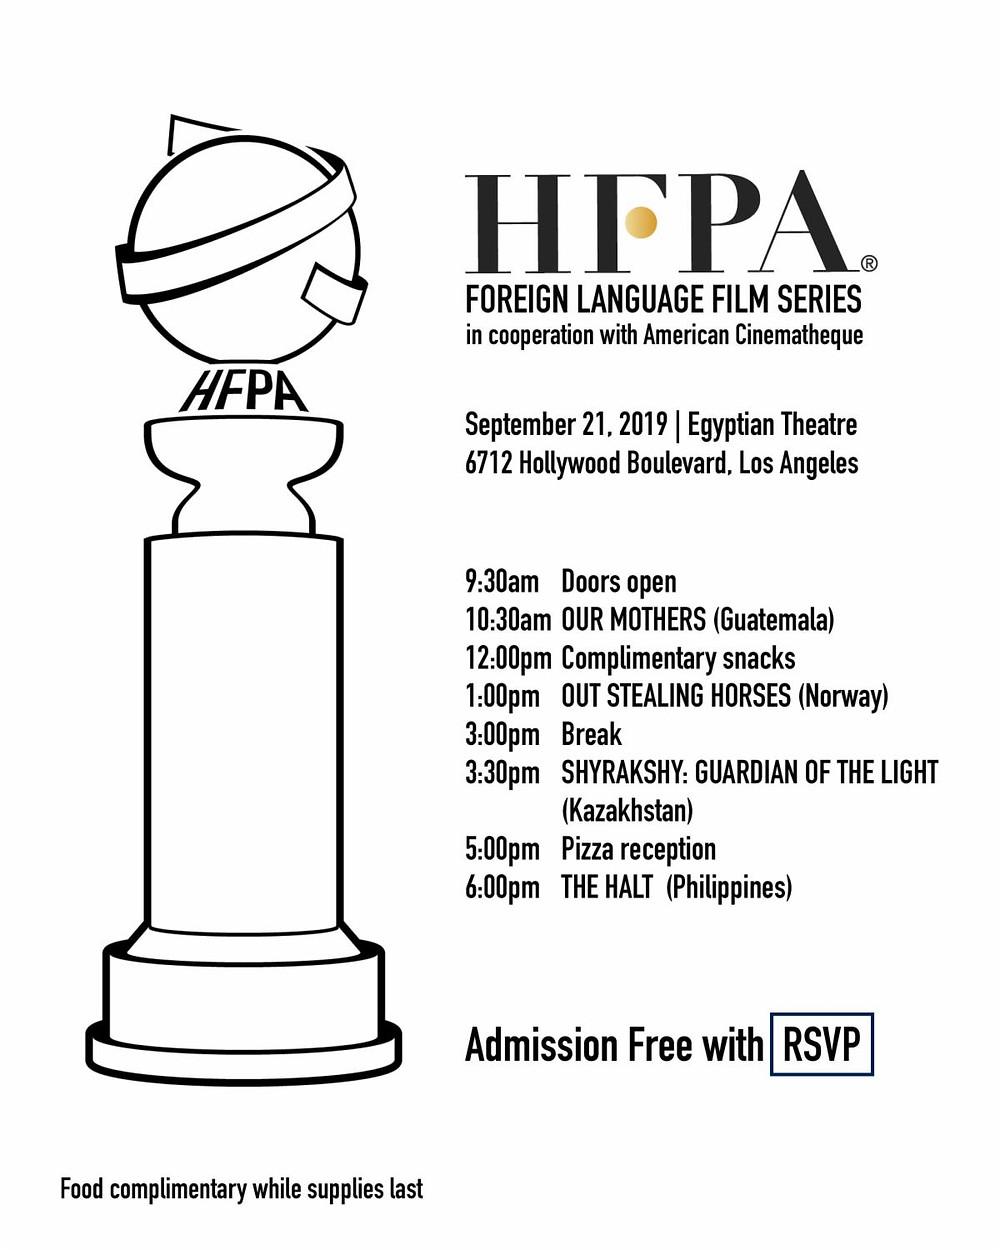 HFPA Program